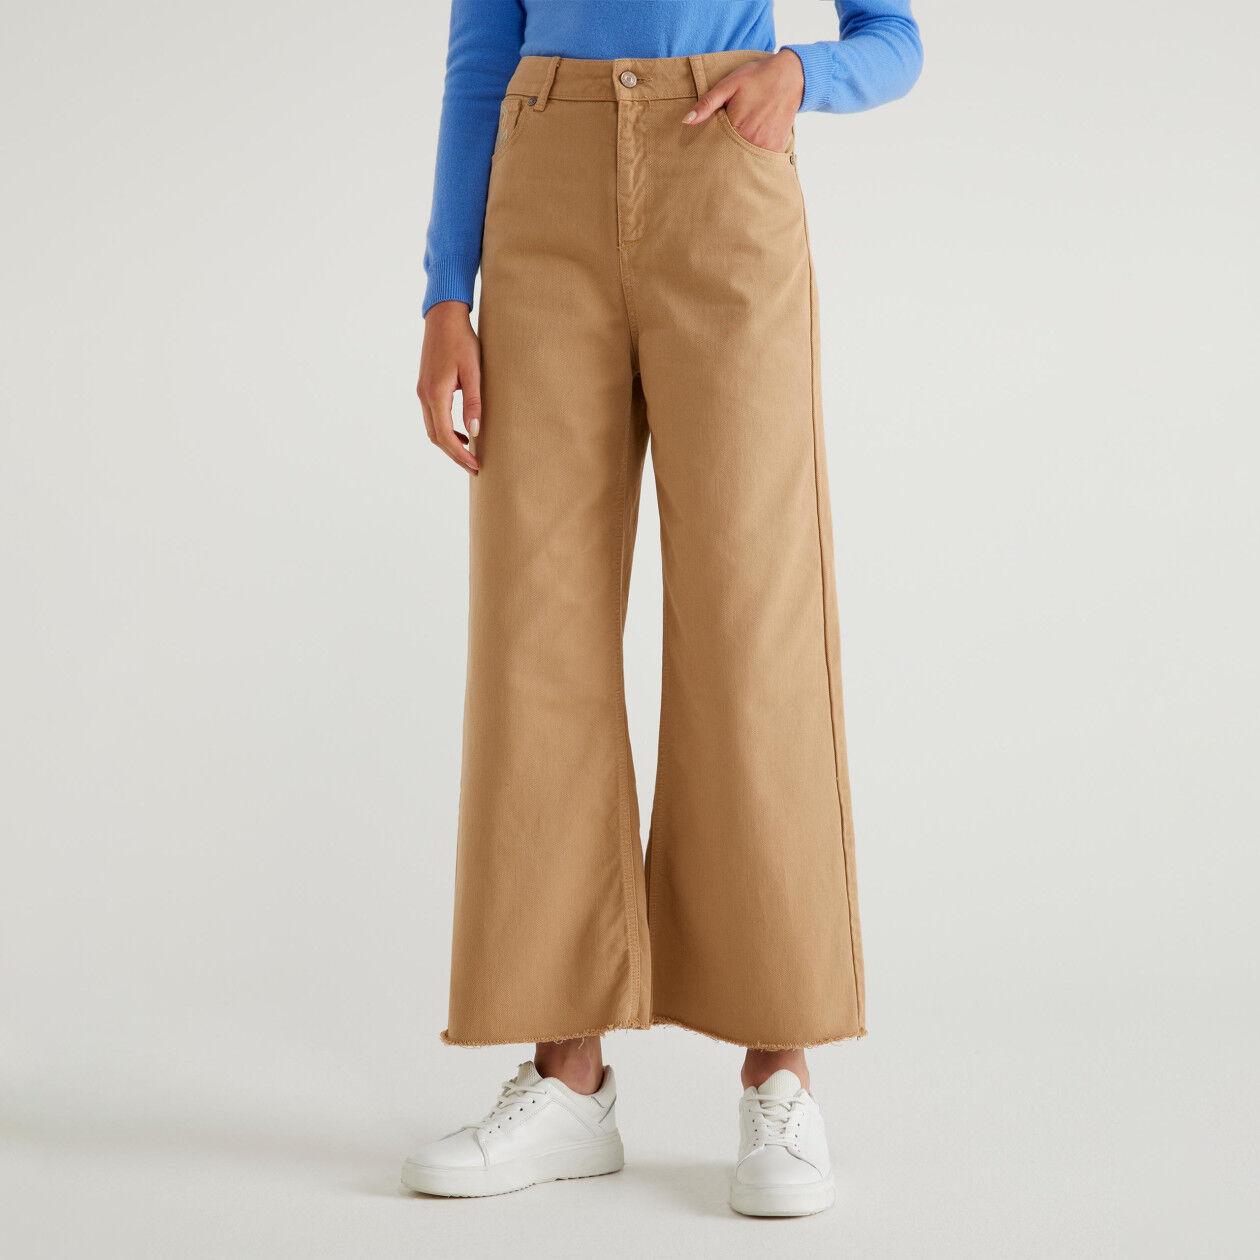 Pantaloni cropped sfrangiati